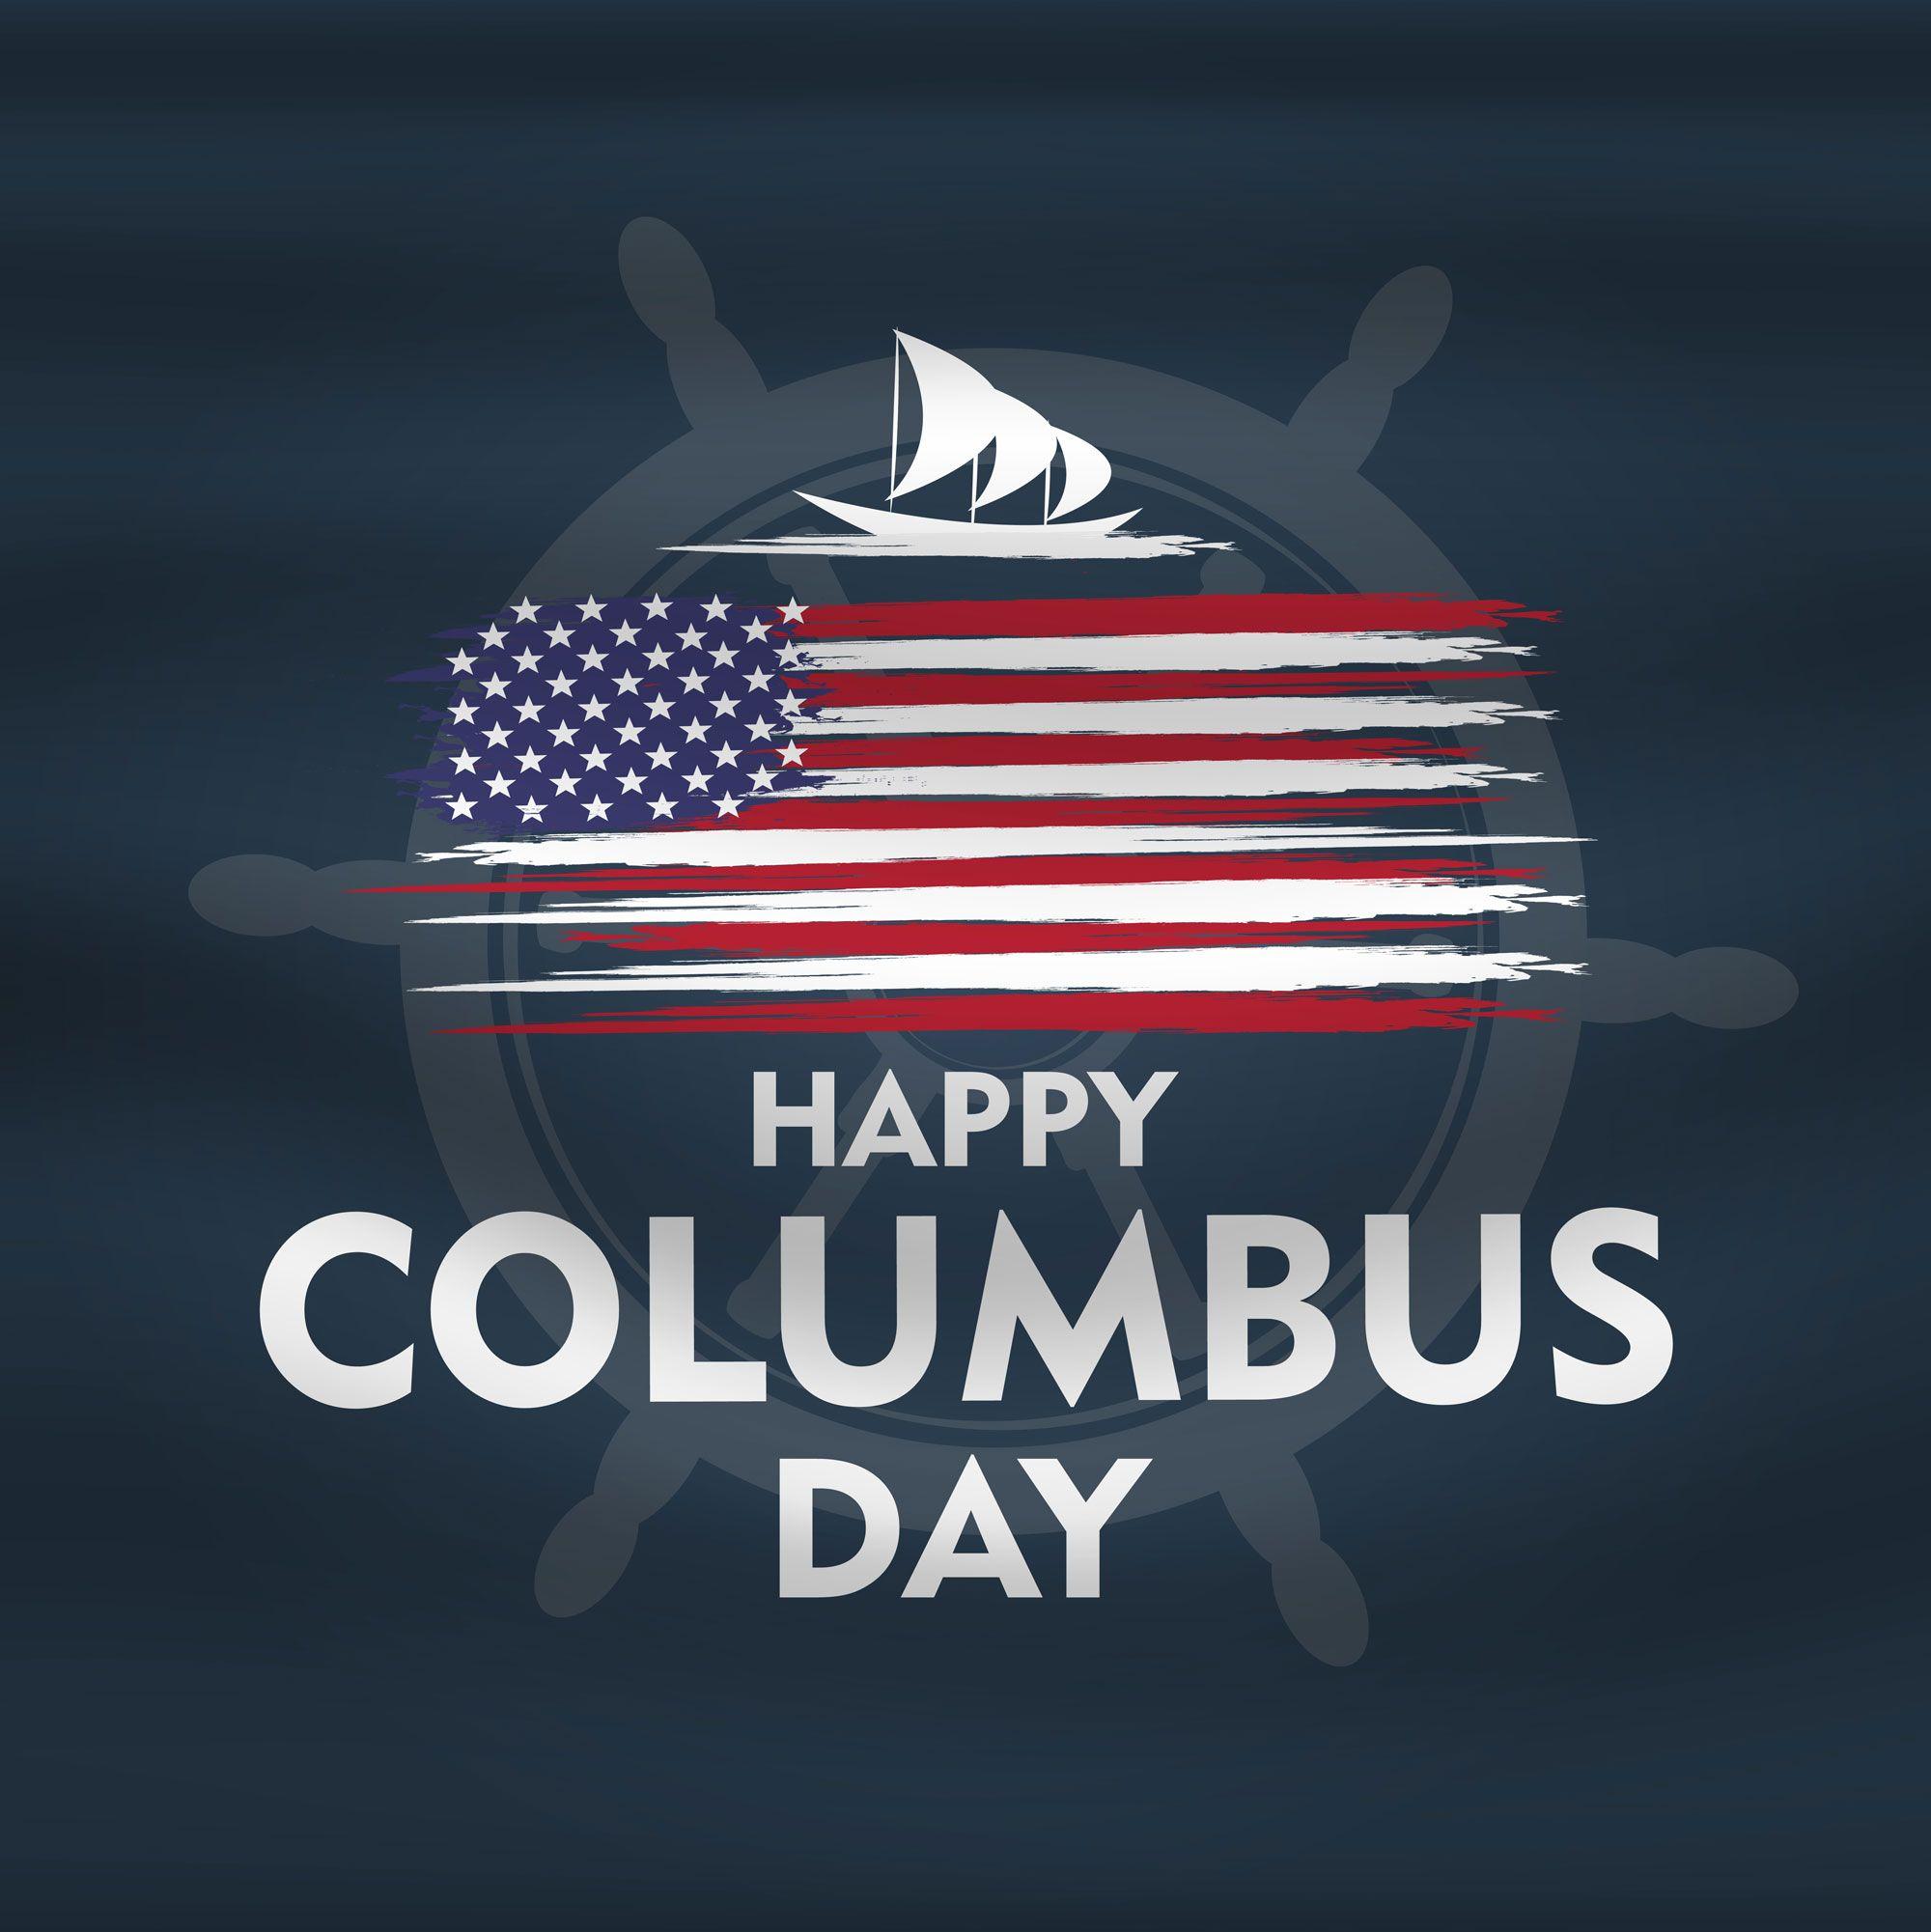 Patriotism Best American Quotes Archives Usa Flag Co Happy Columbus Day Patriotic Quotes American Quotes